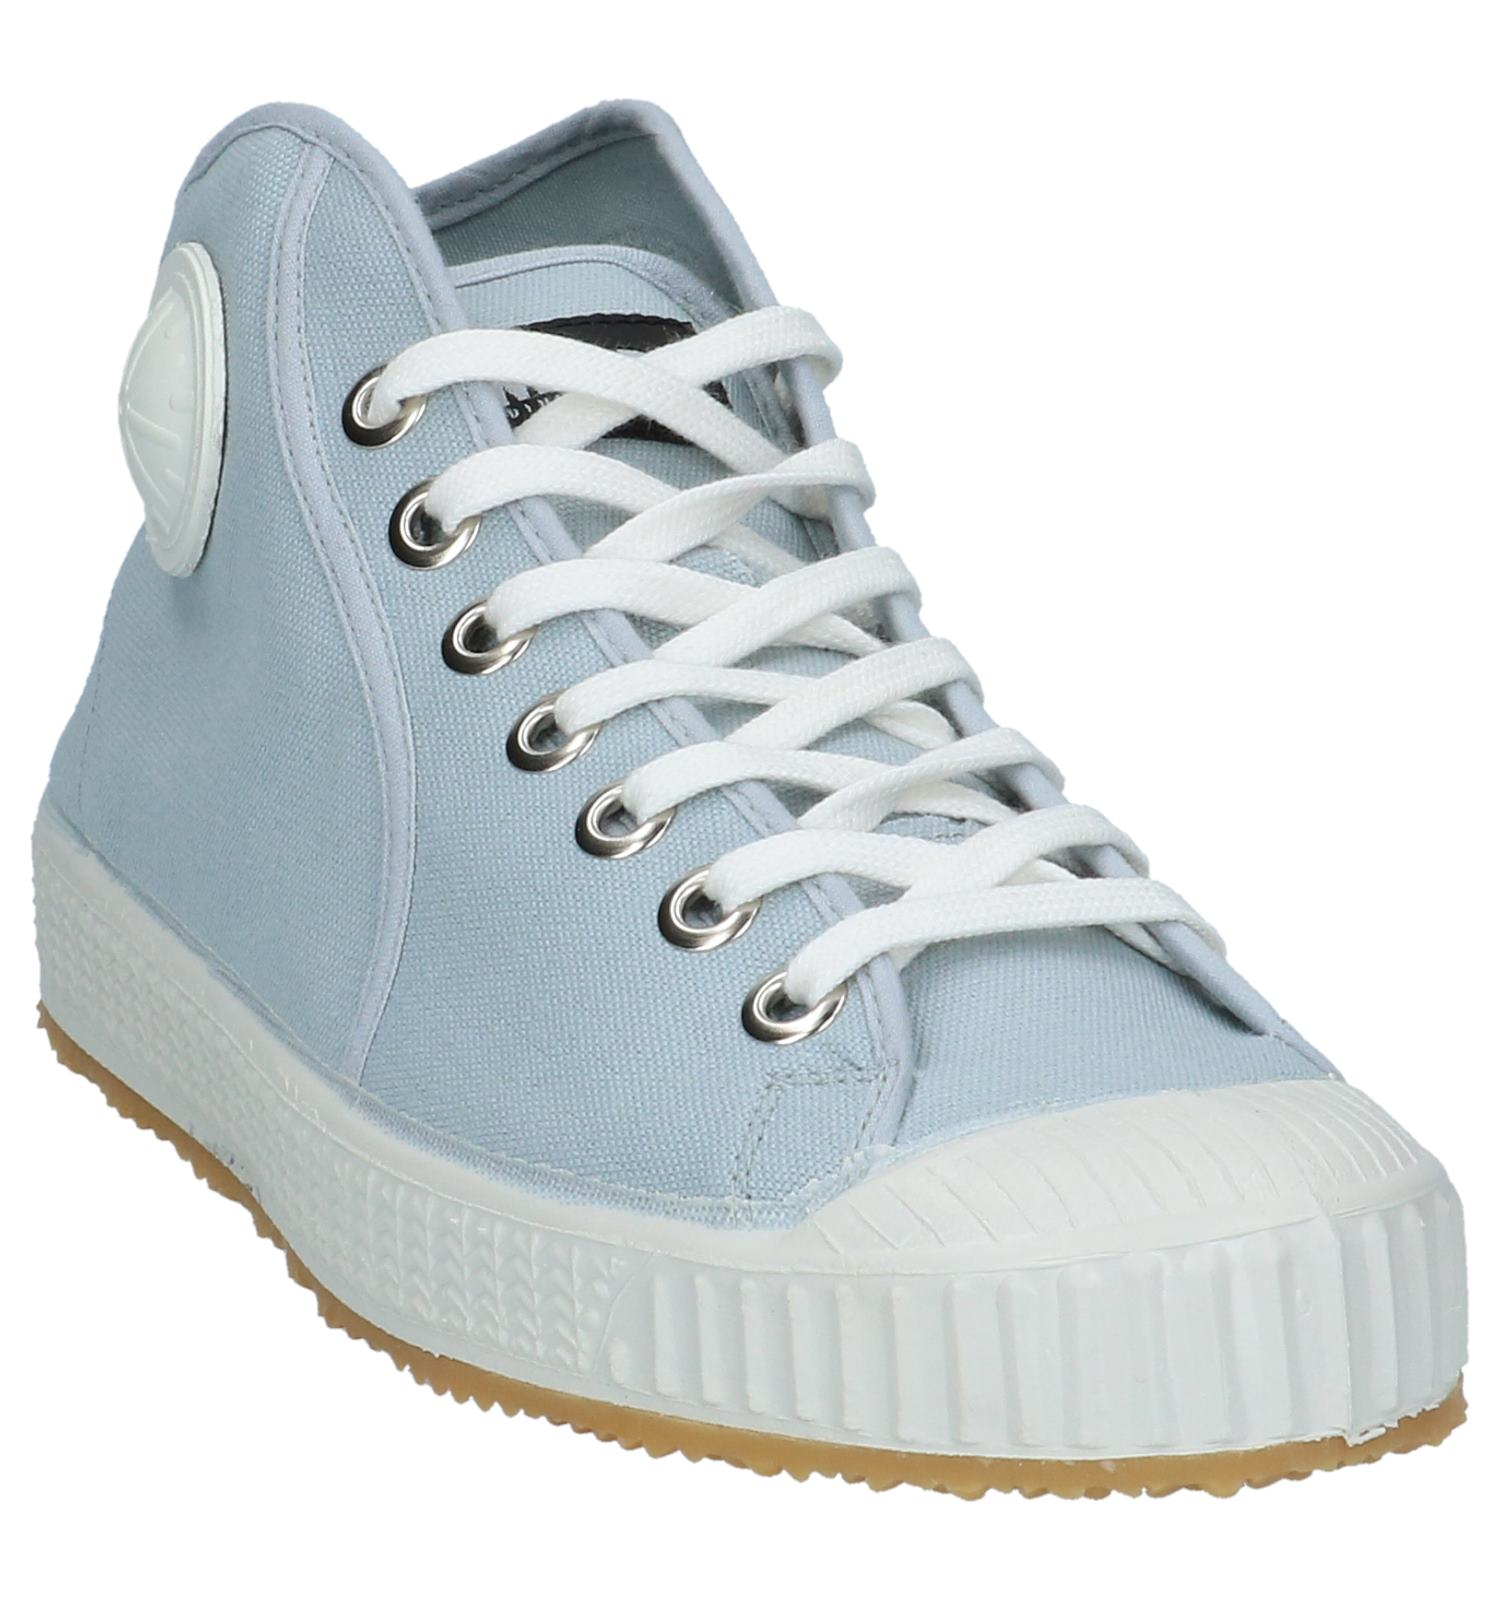 Lichtblauwe Sportieve Komrads Hoge Sneakers Belgrado Ybf7I6vgy